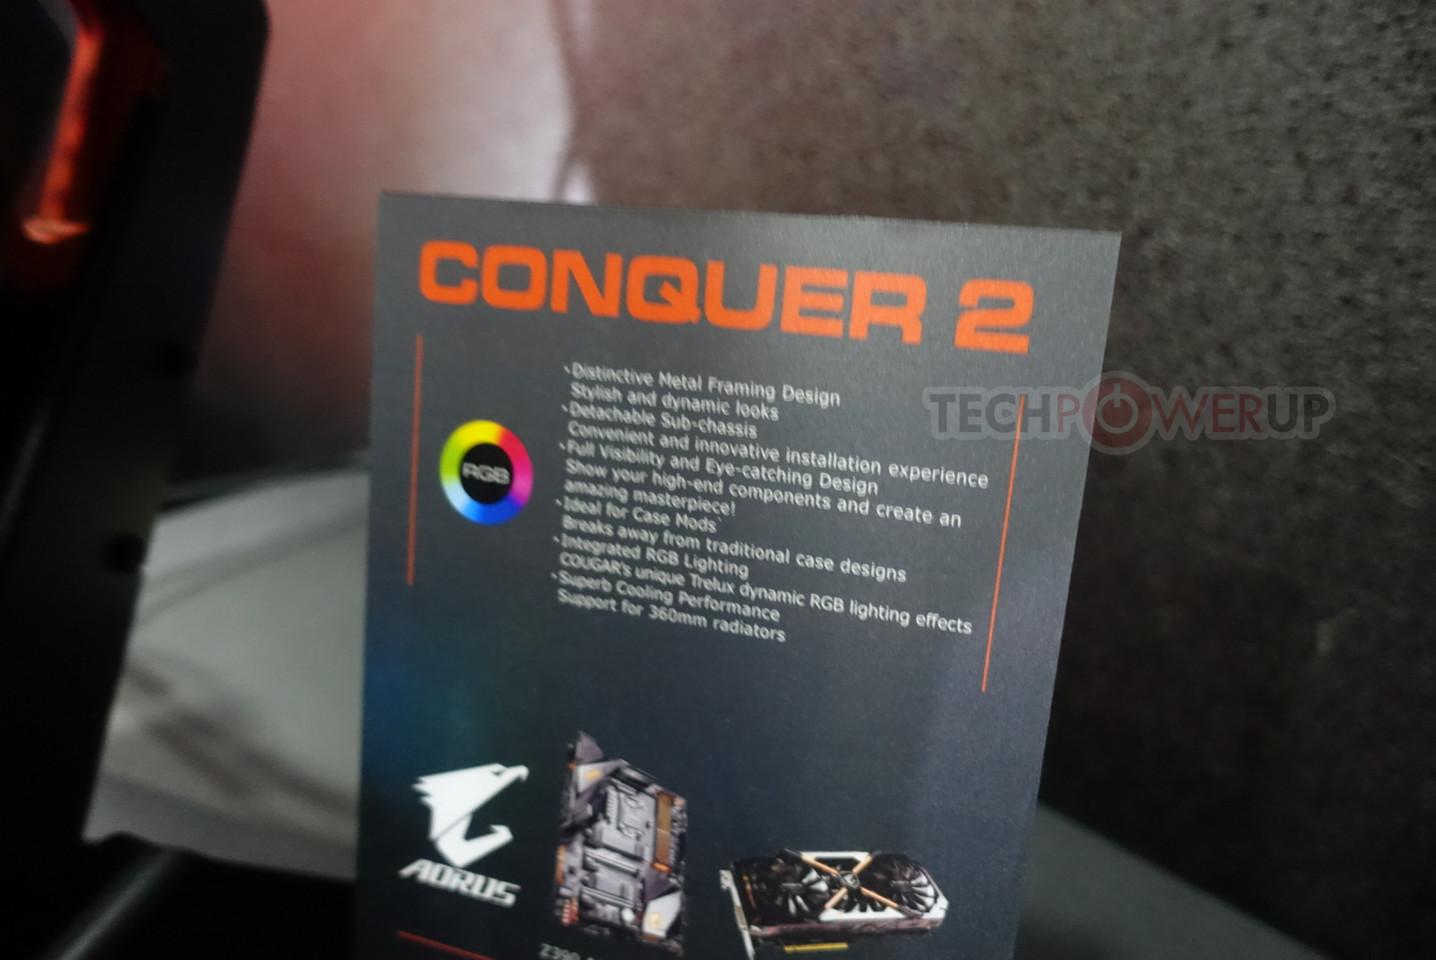 Cougar at COMPUTEX 2019: Conquer 2, Gemini S, Gemini M, and Blazer